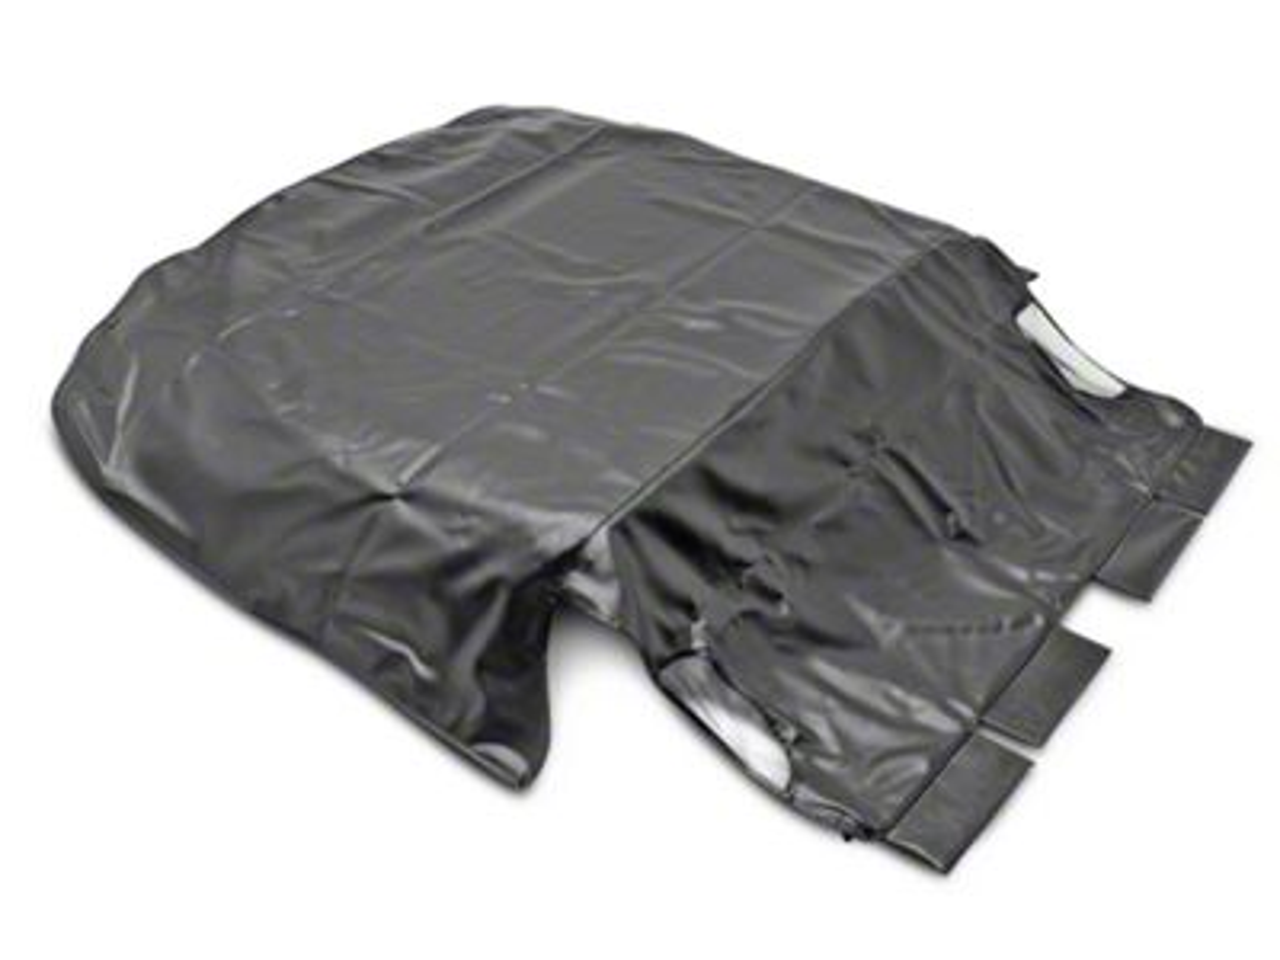 OPR Convertible Top Boot - Black (99-04 Convertible)